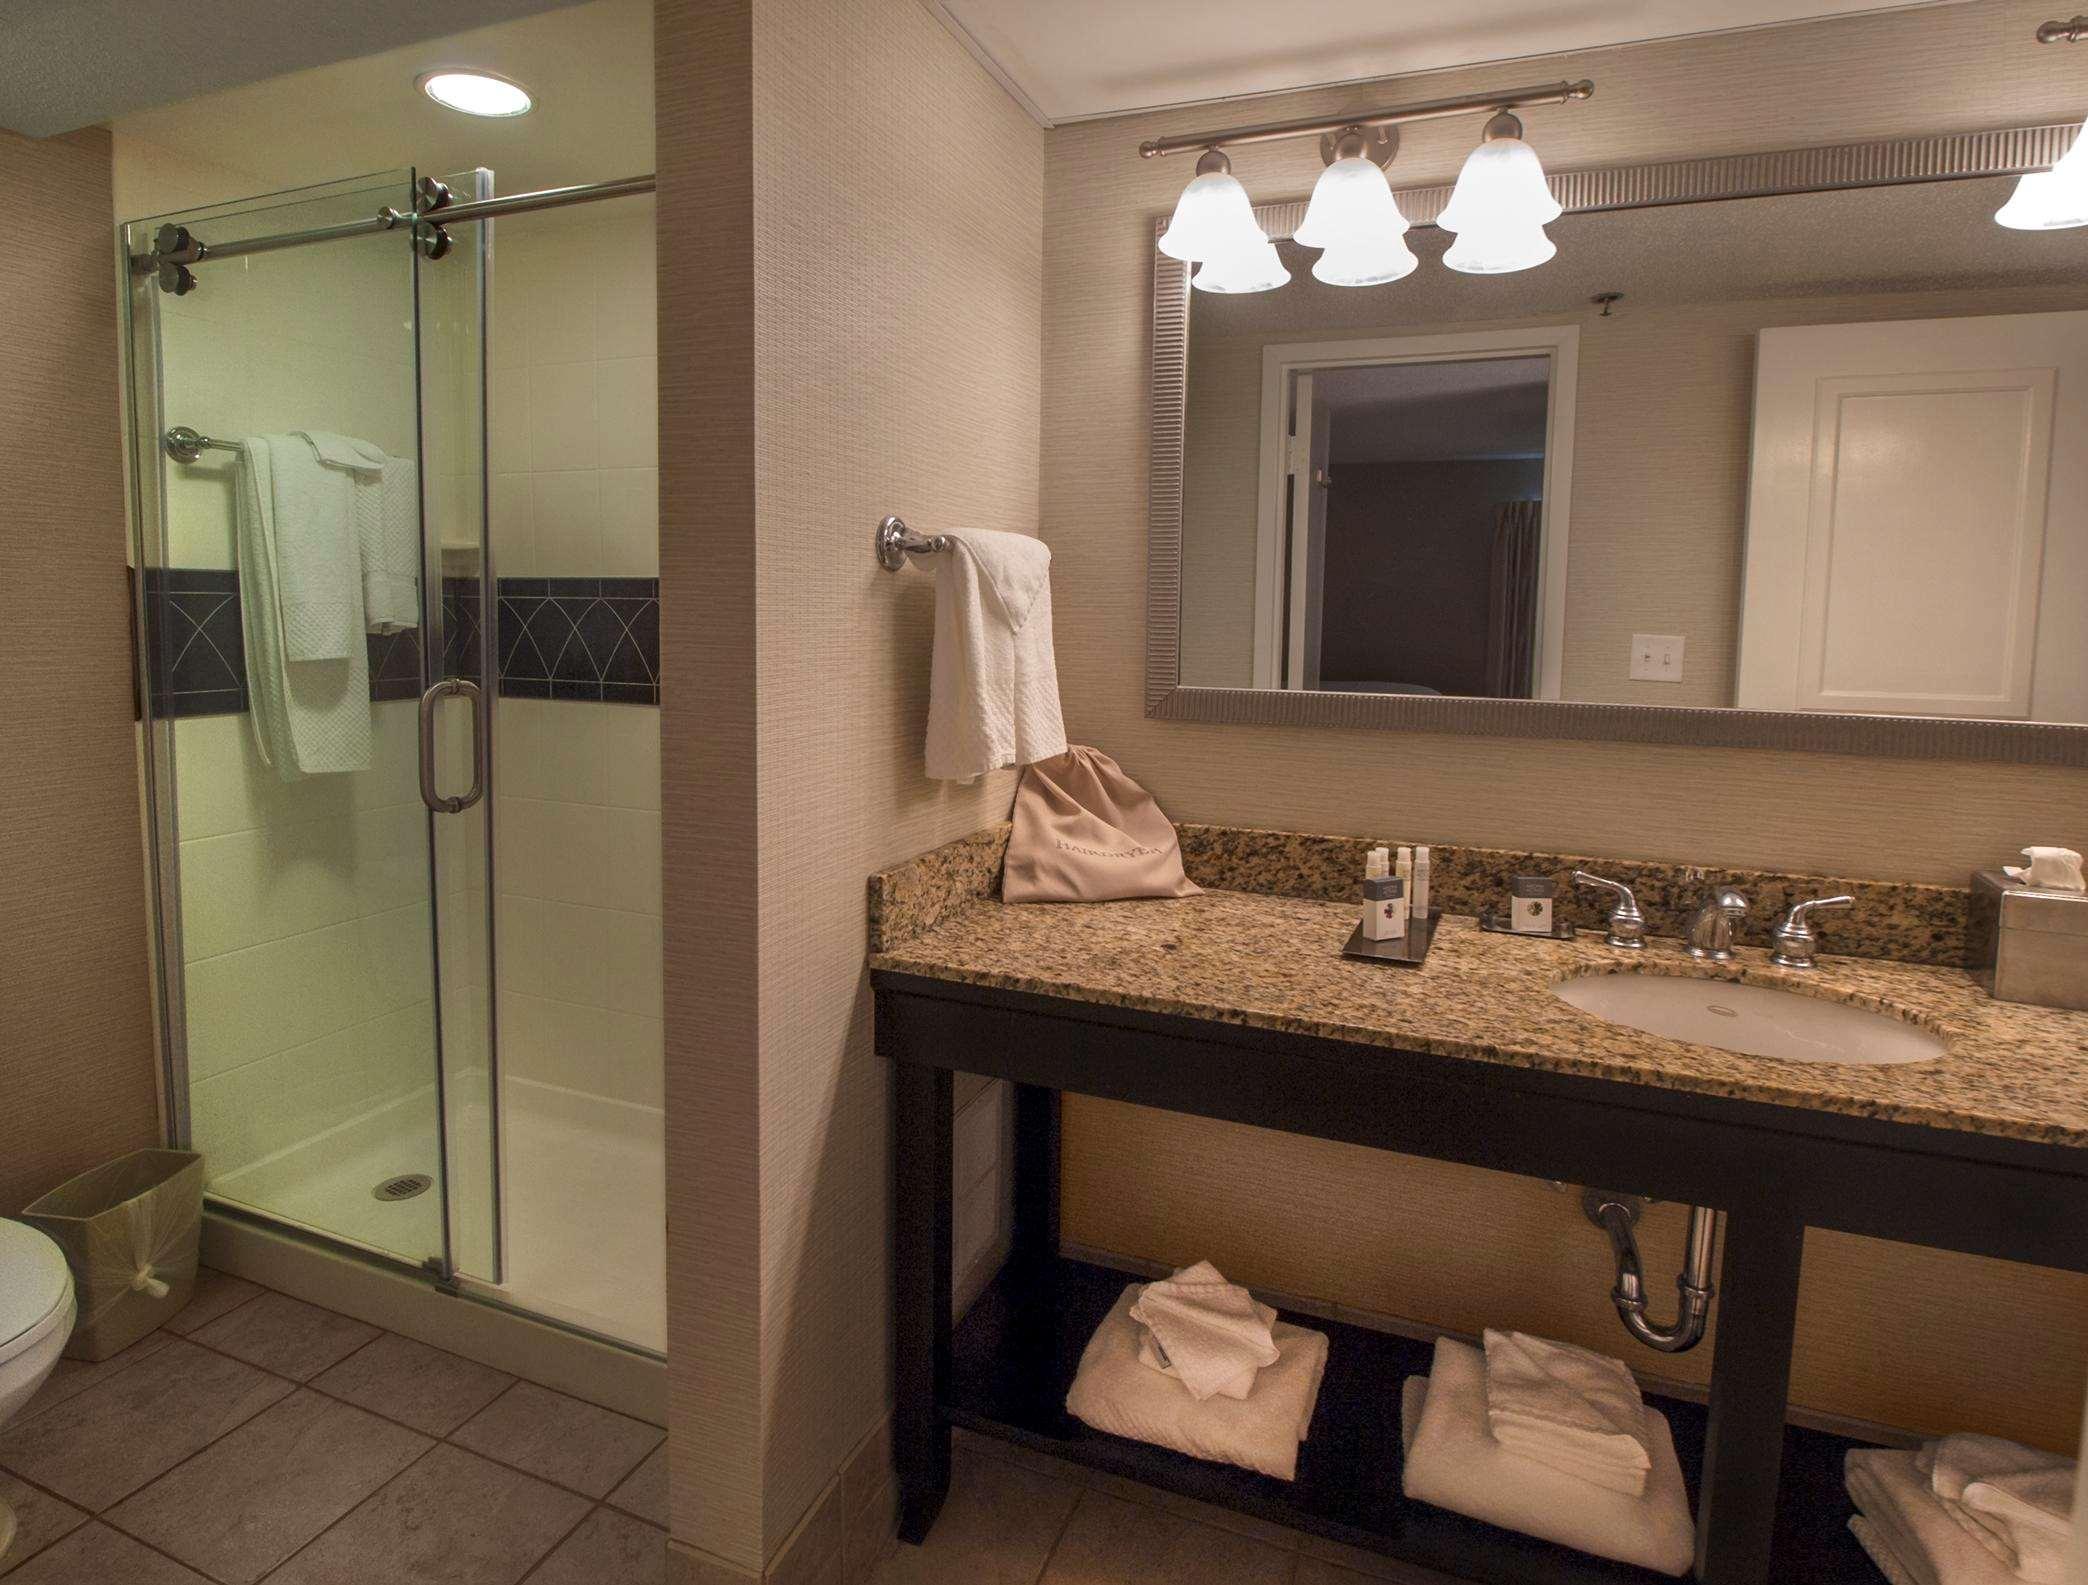 DoubleTree by Hilton Hotel Buffalo - Amherst image 15